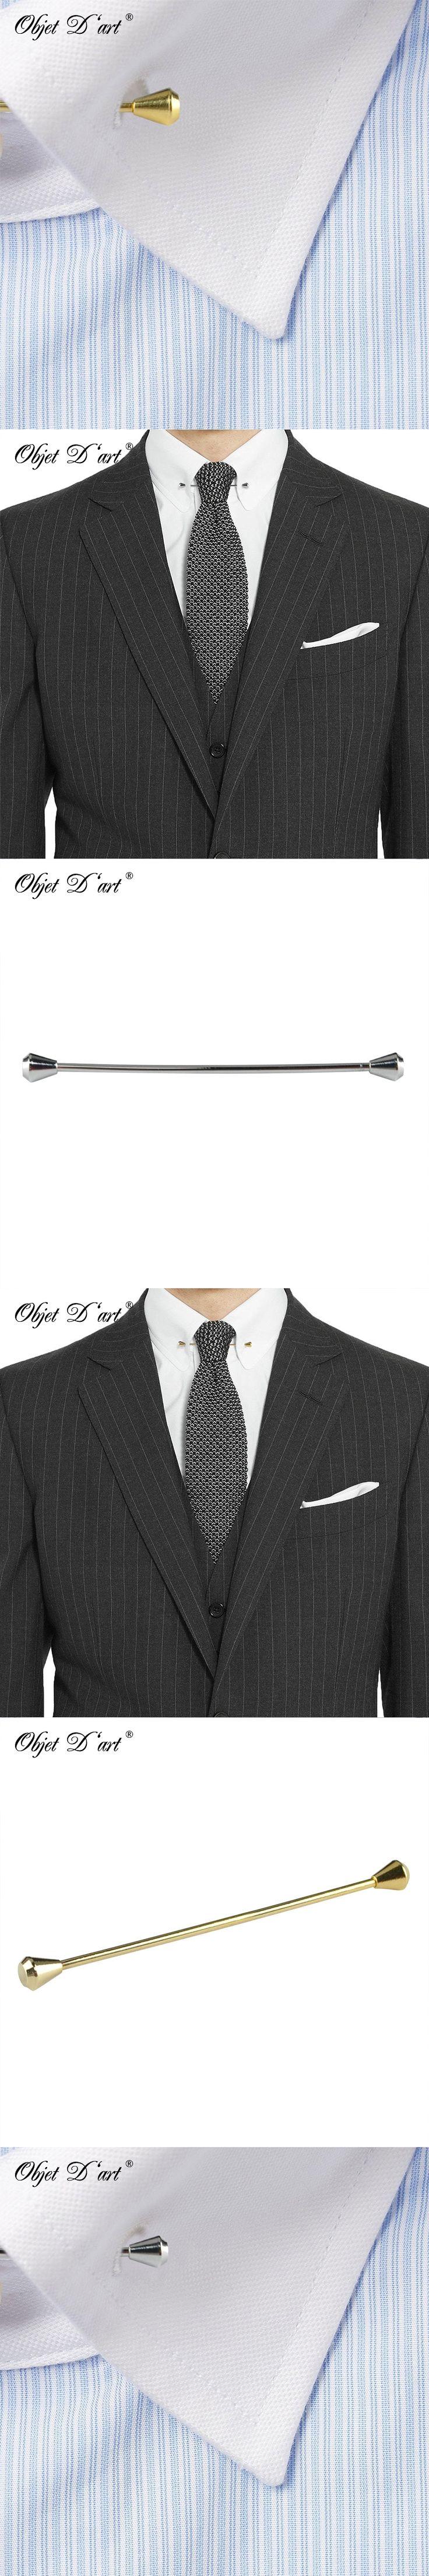 Fshion Collar Brooch Men Suit Lapel Pin Blue Top Men's Jewelry Modern Executive Wedding Business Collar Pin Bar Suit Accessories